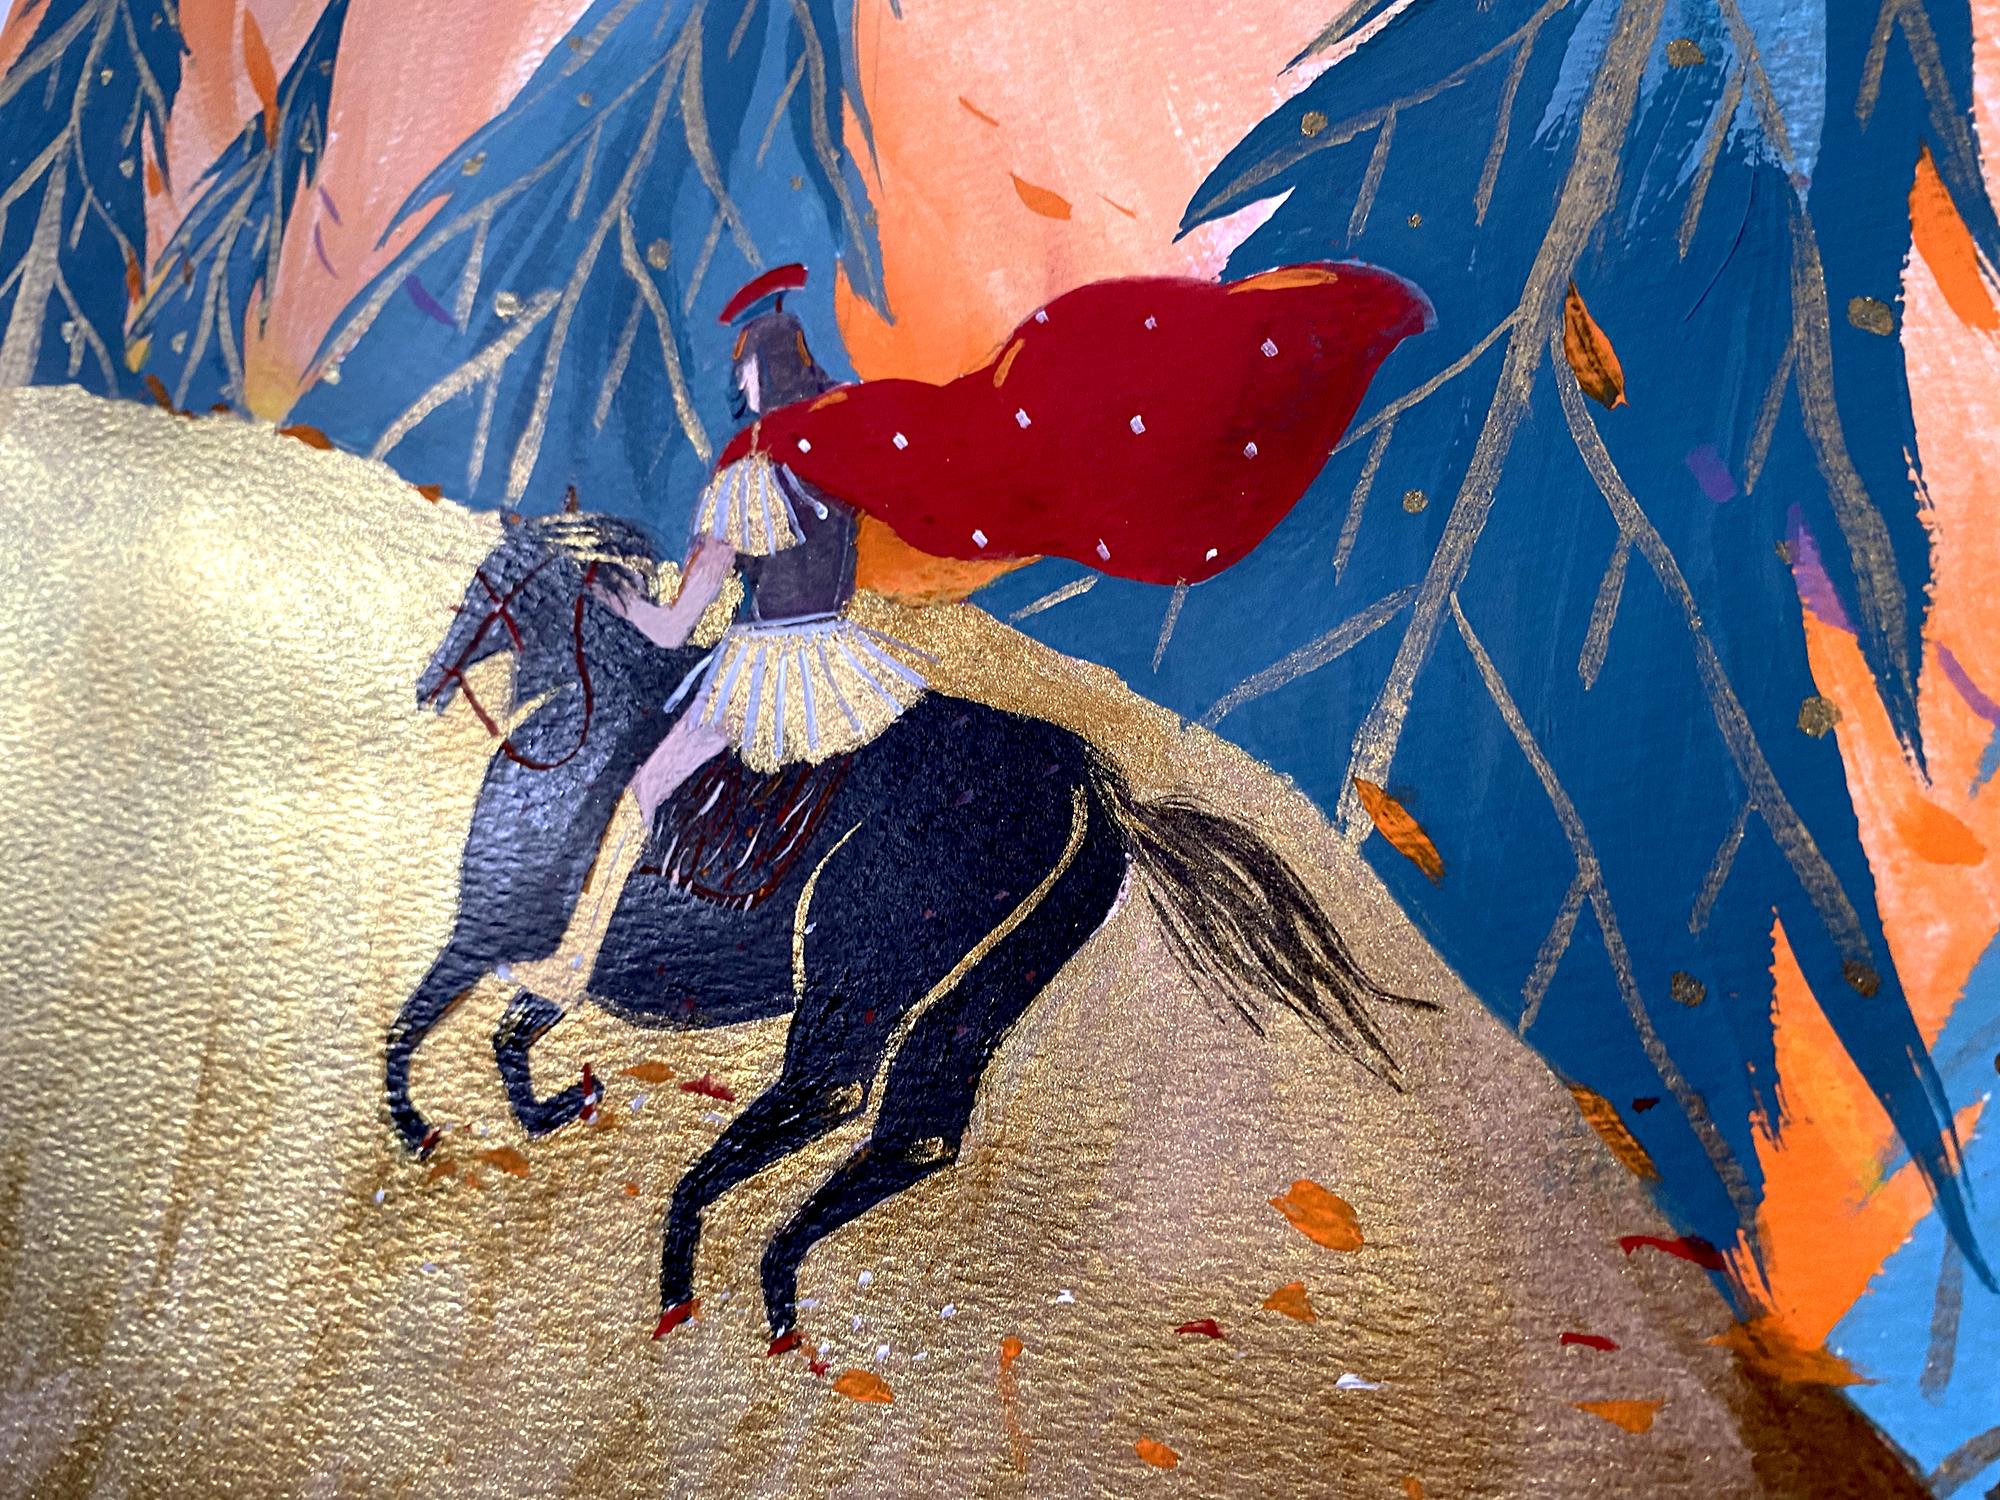 dochia-horse-riding-illustration-alice-allistration